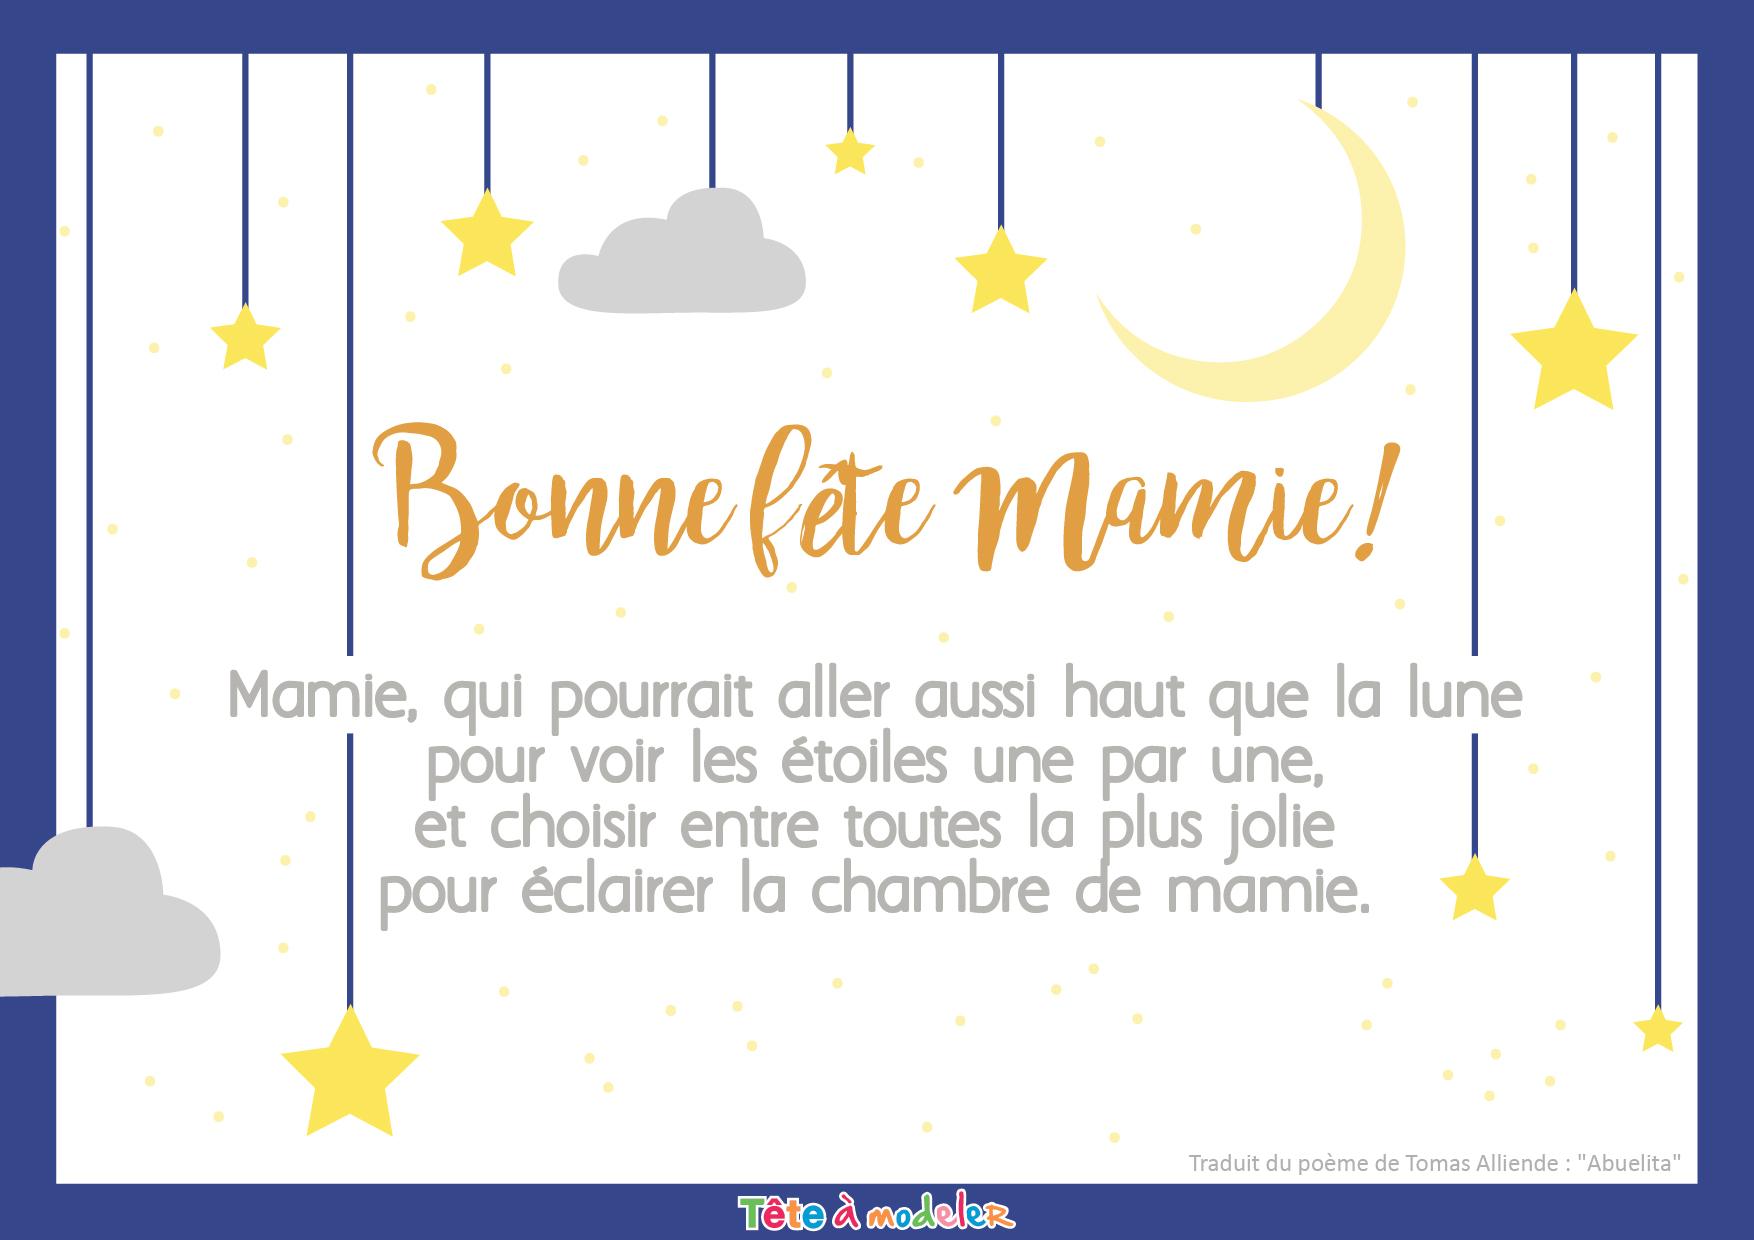 Proverbe Damour Pour Sa Maman Poeme Danniversaire